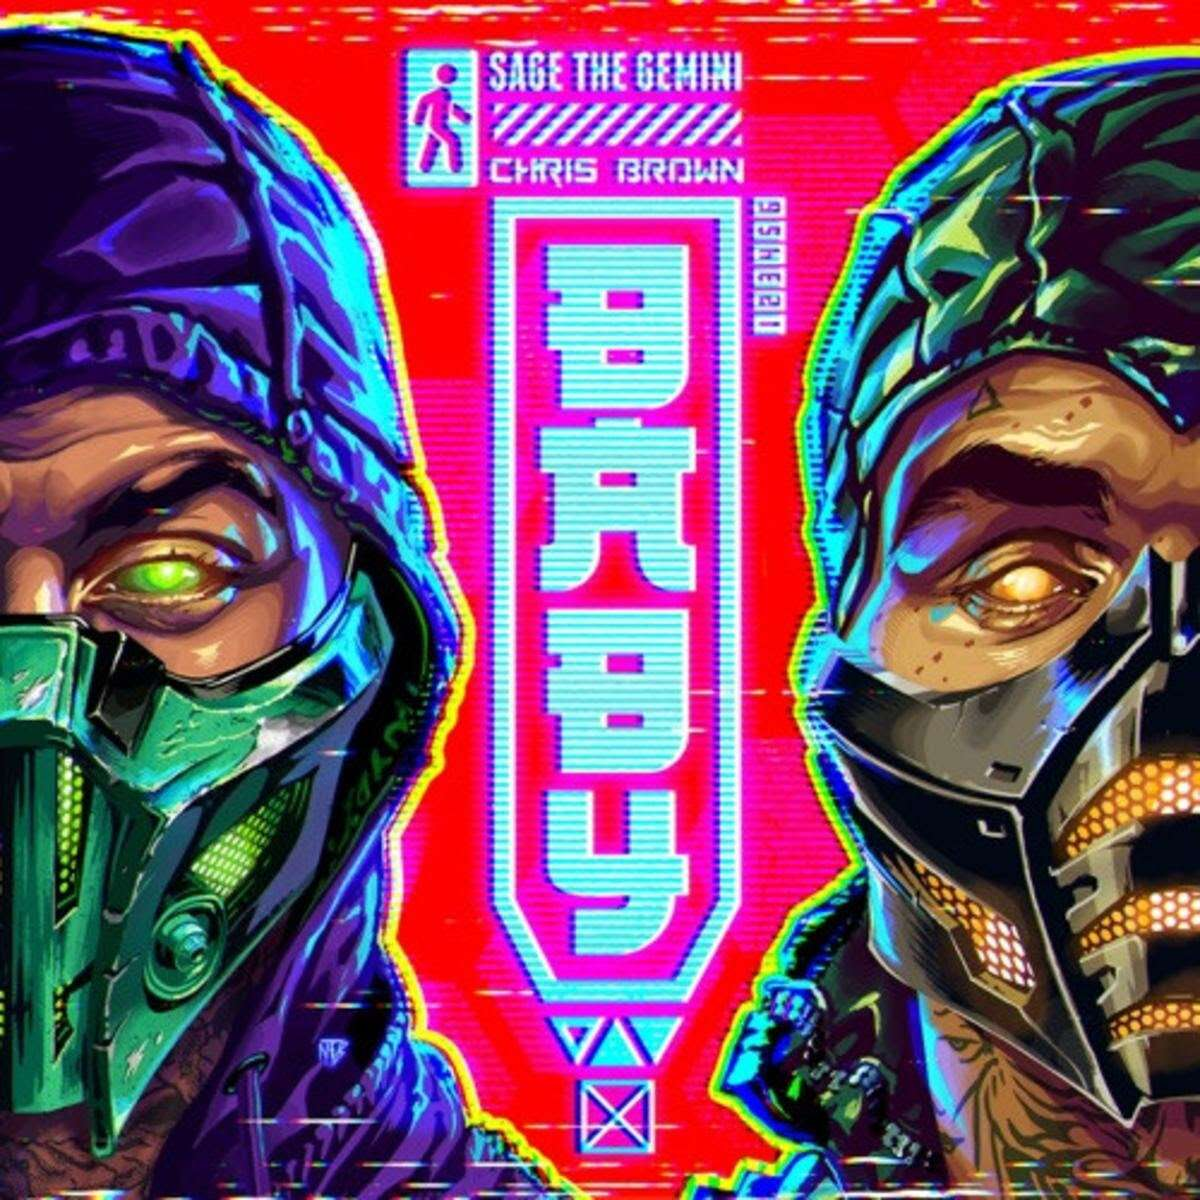 Sage The Gemini & Chris Brown - Baby